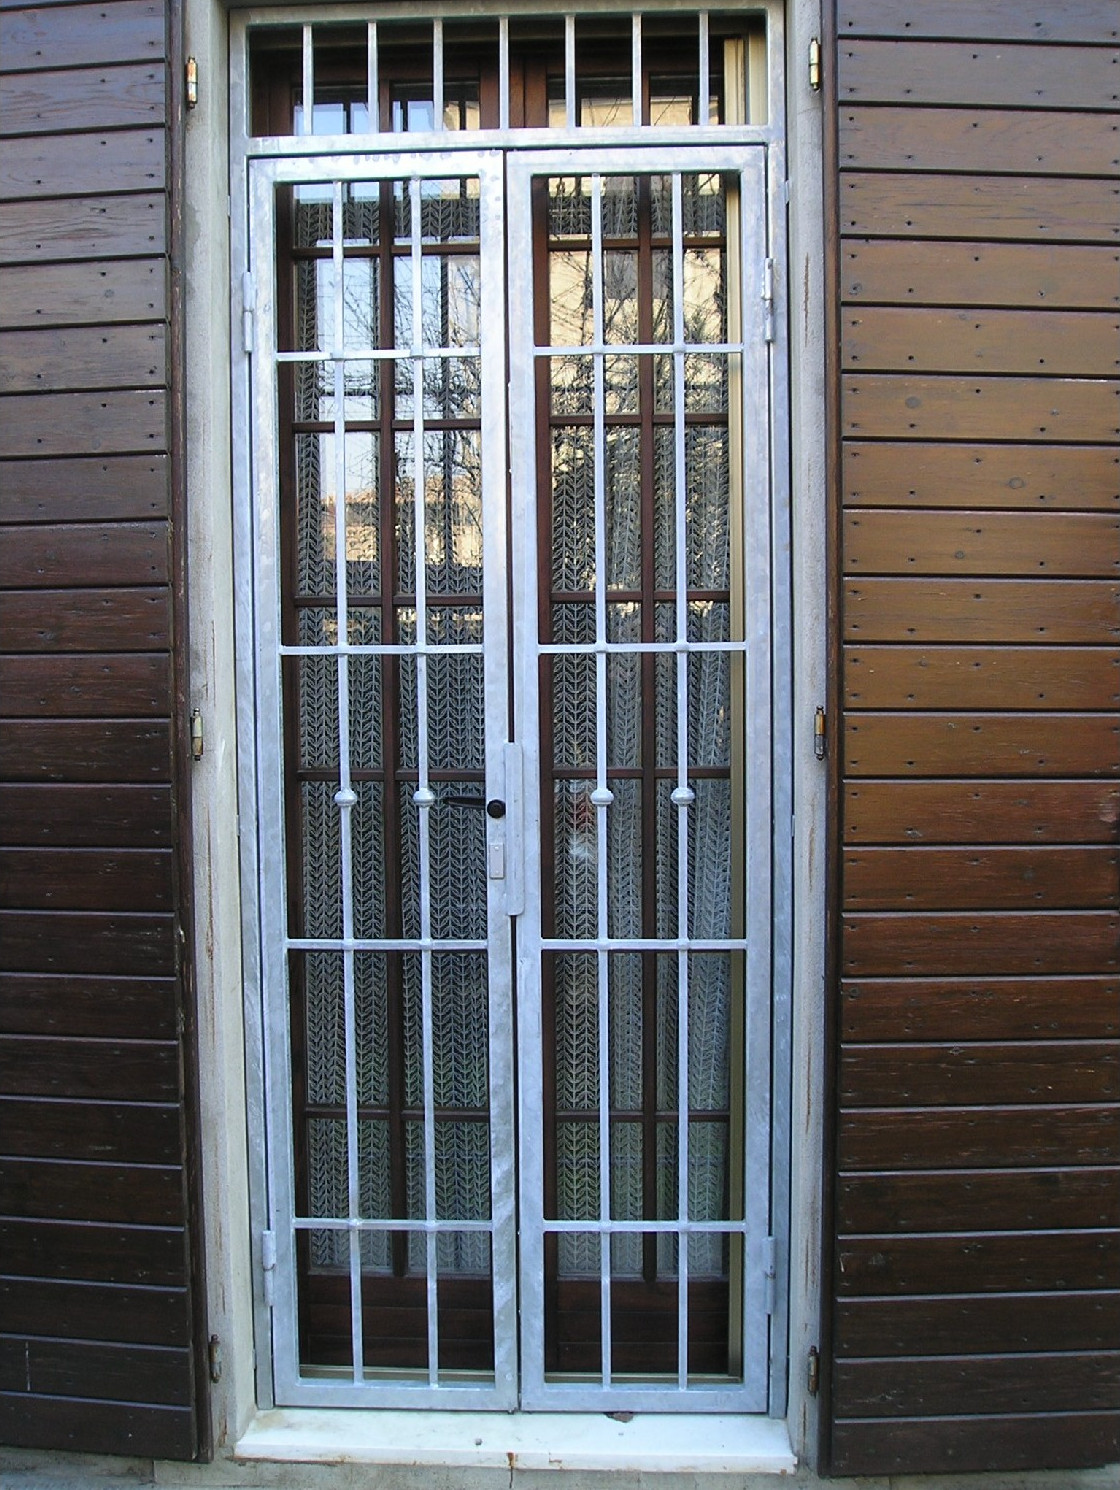 Metal service s r l - Hermes porte e finestre srl ...